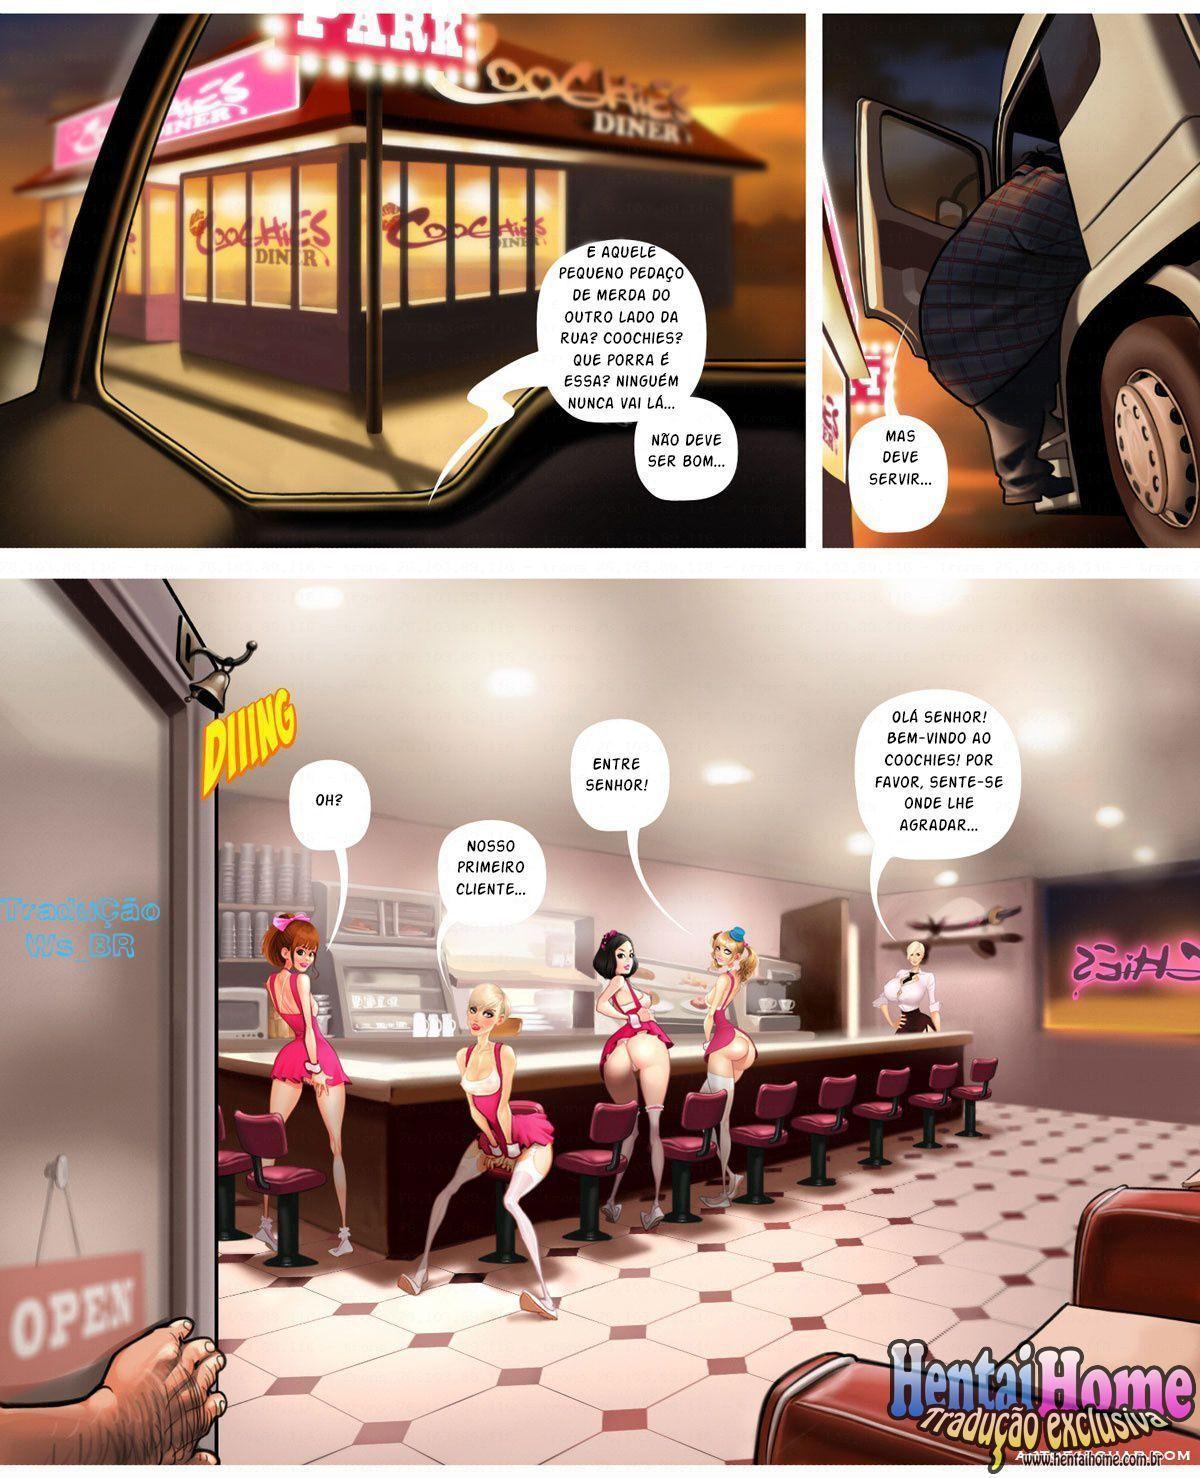 Restaurante-das-garçonetes-sexy-4